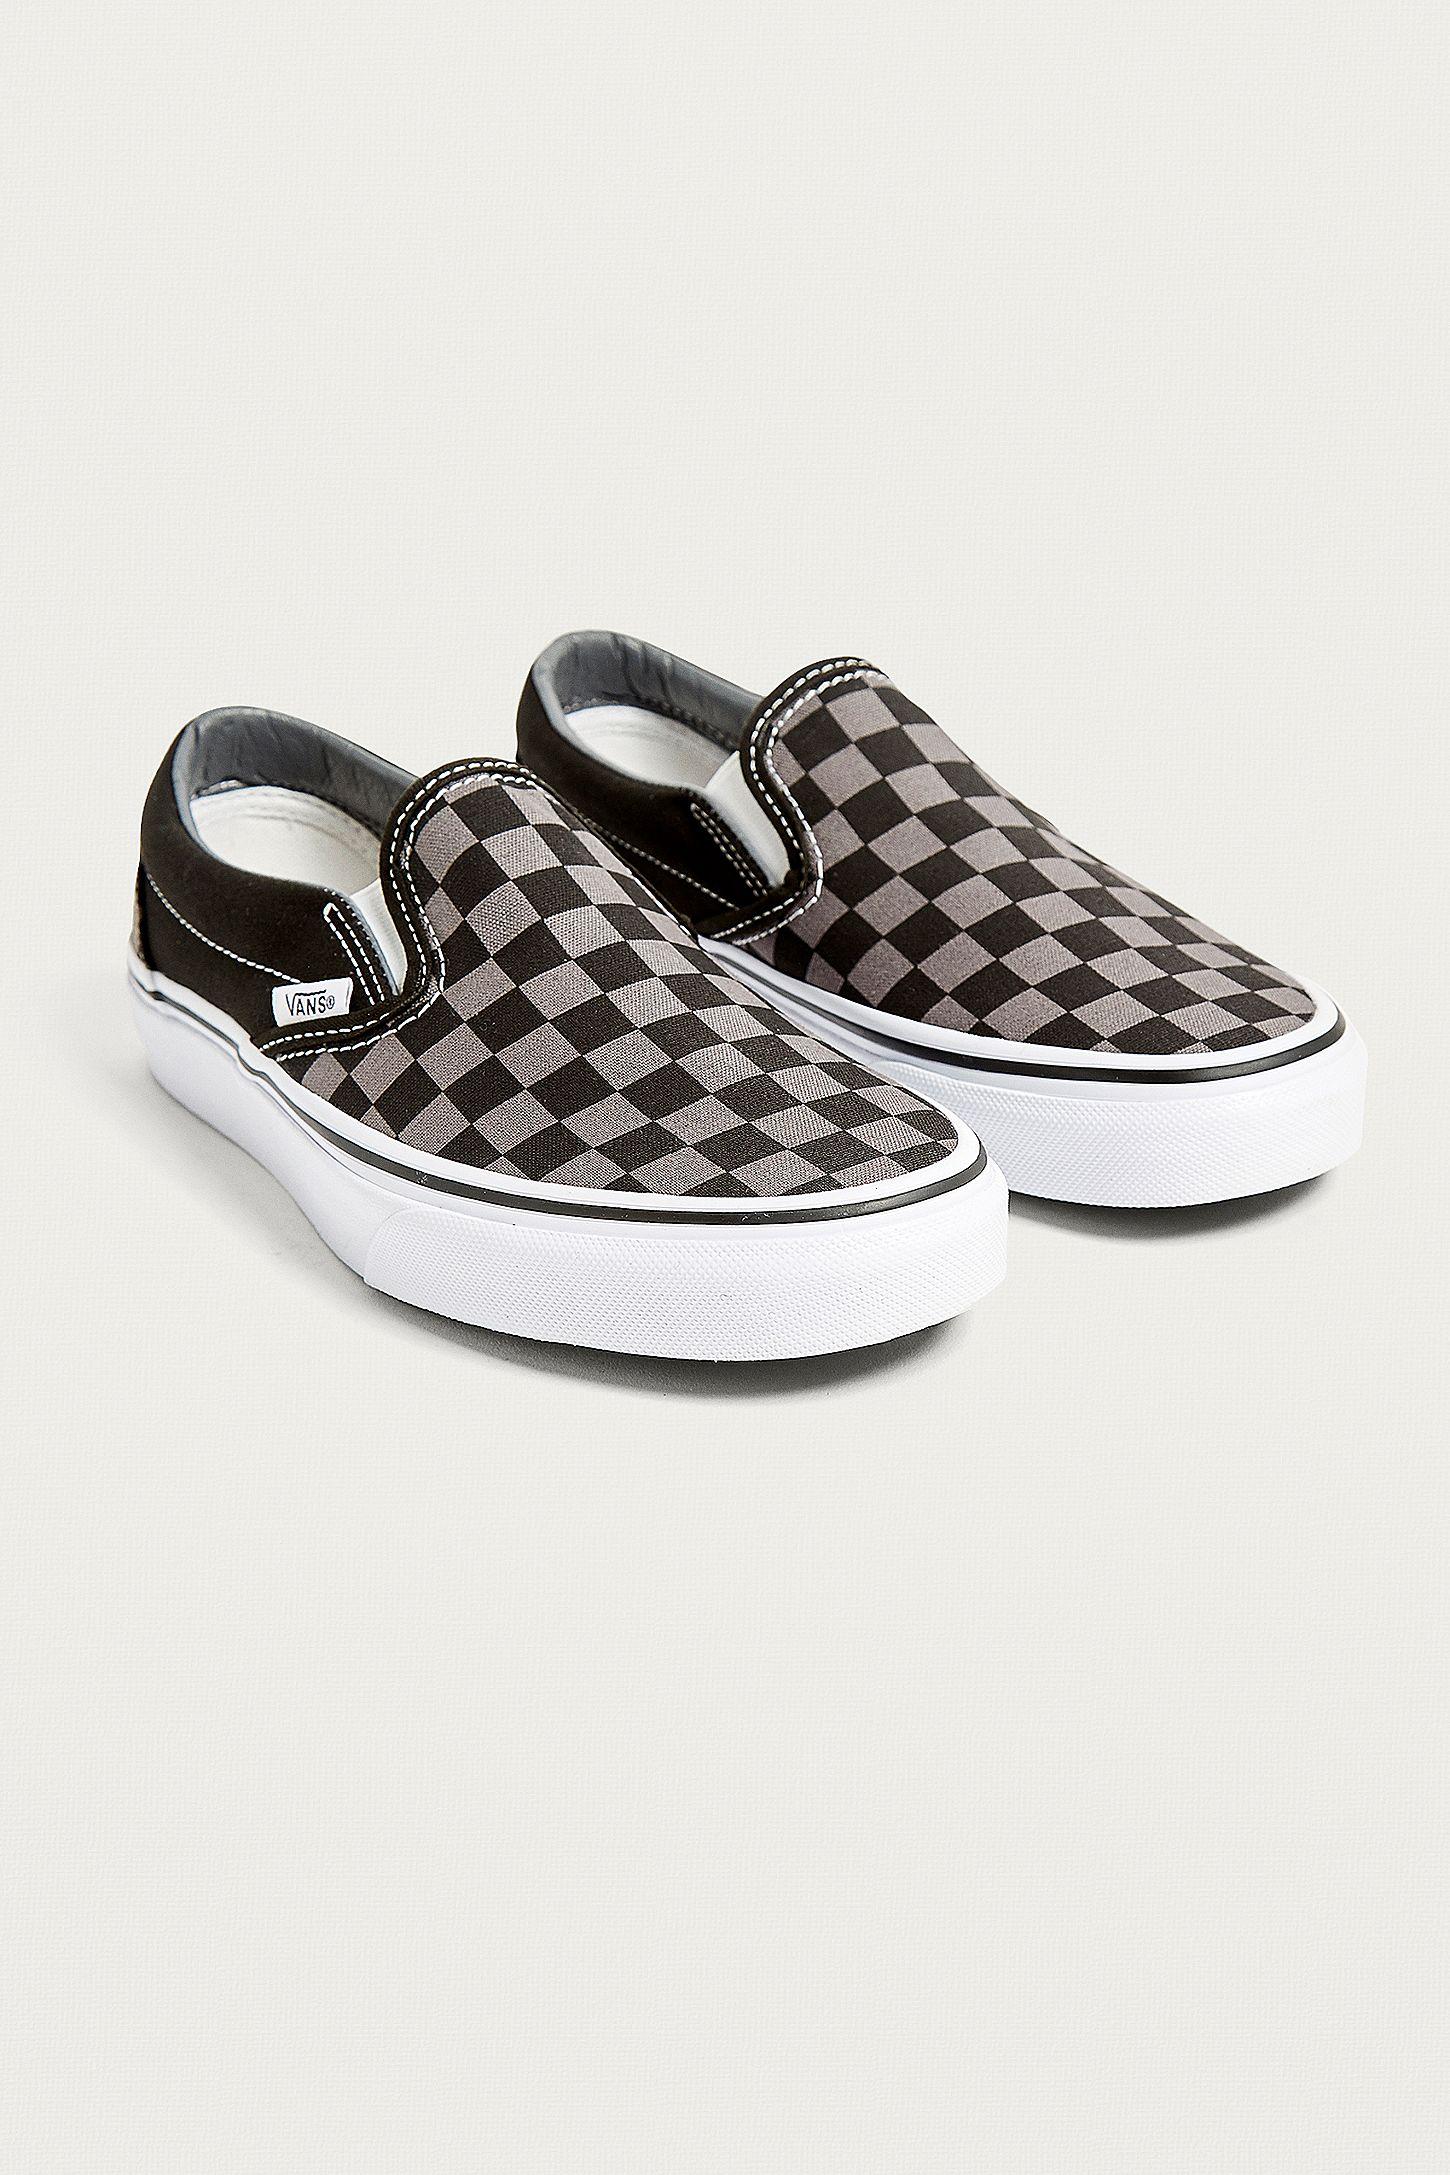 0a965aada60088 Vans Black and Grey Checkerboard Slip-On Trainers